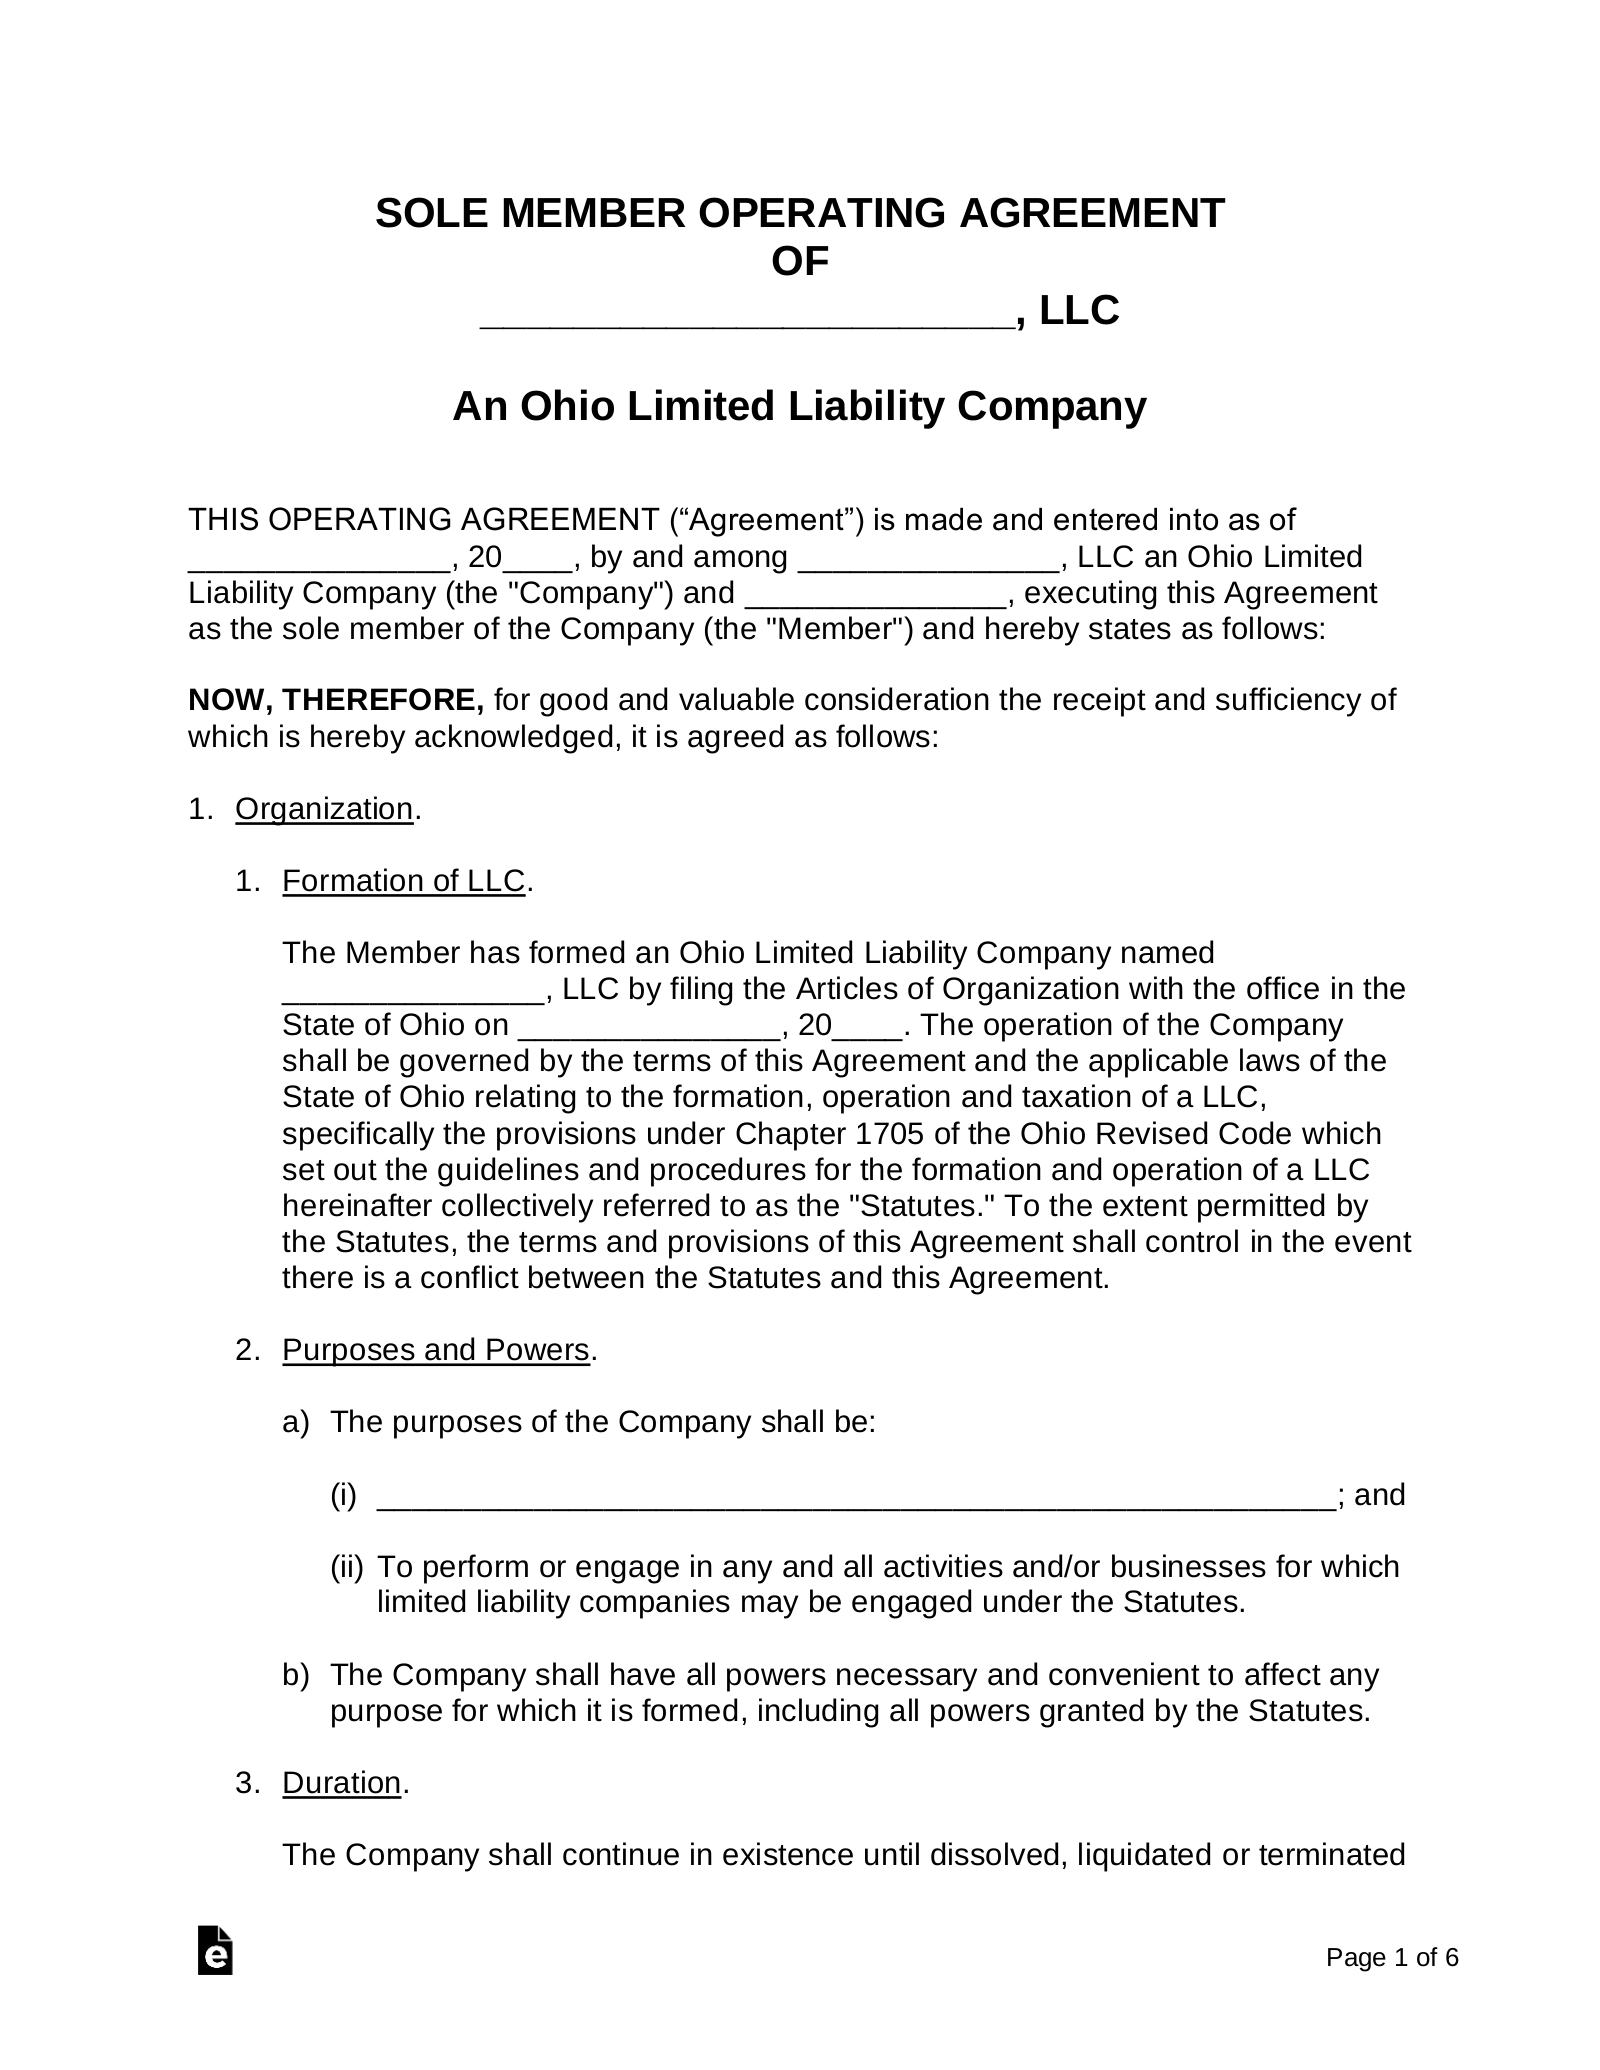 Free Ohio Single Member LLC Operating Agreement Form - PDF ...